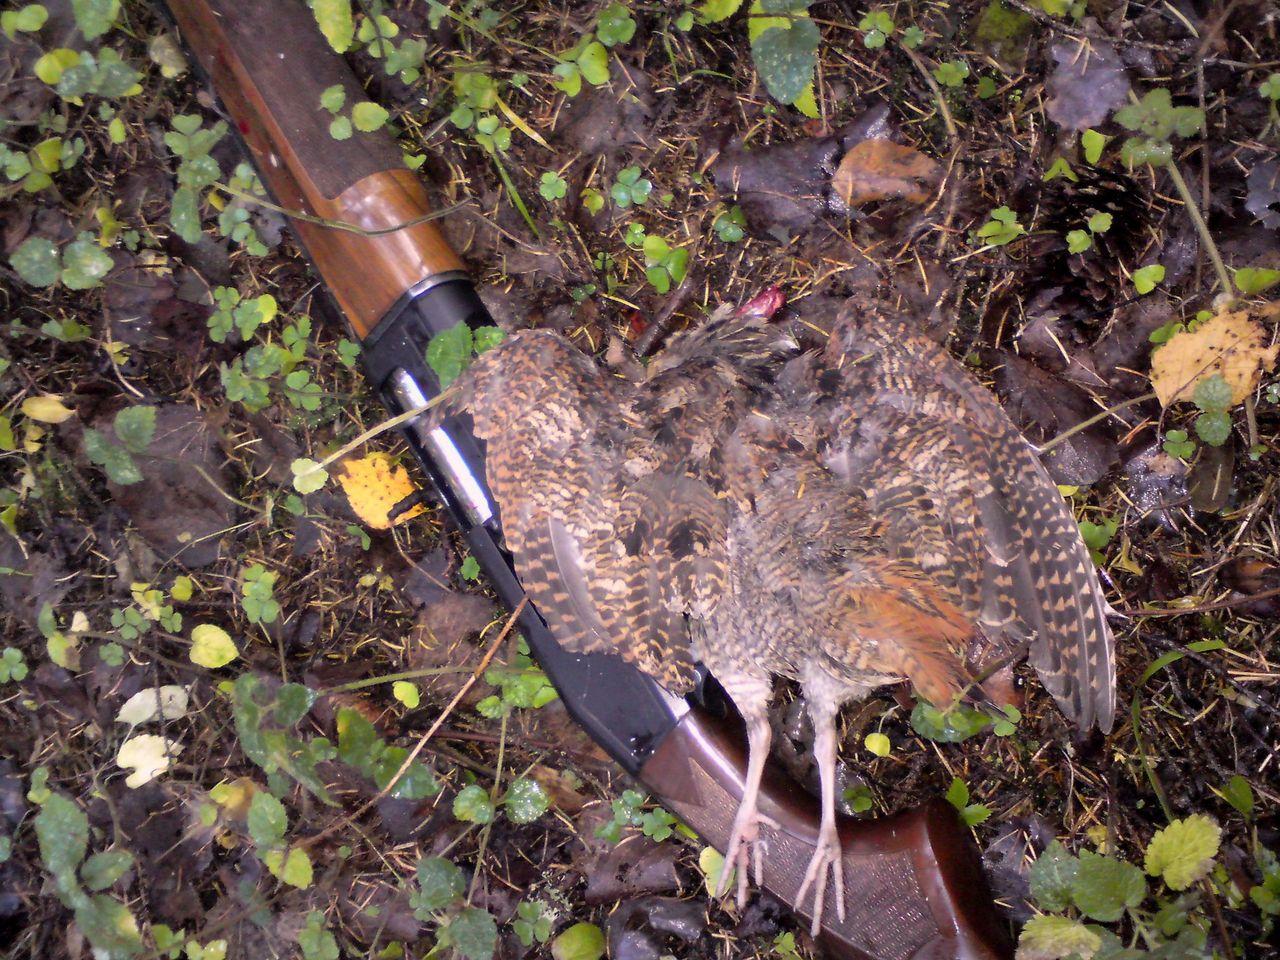 дробь для охоты на фазана далее термобелье